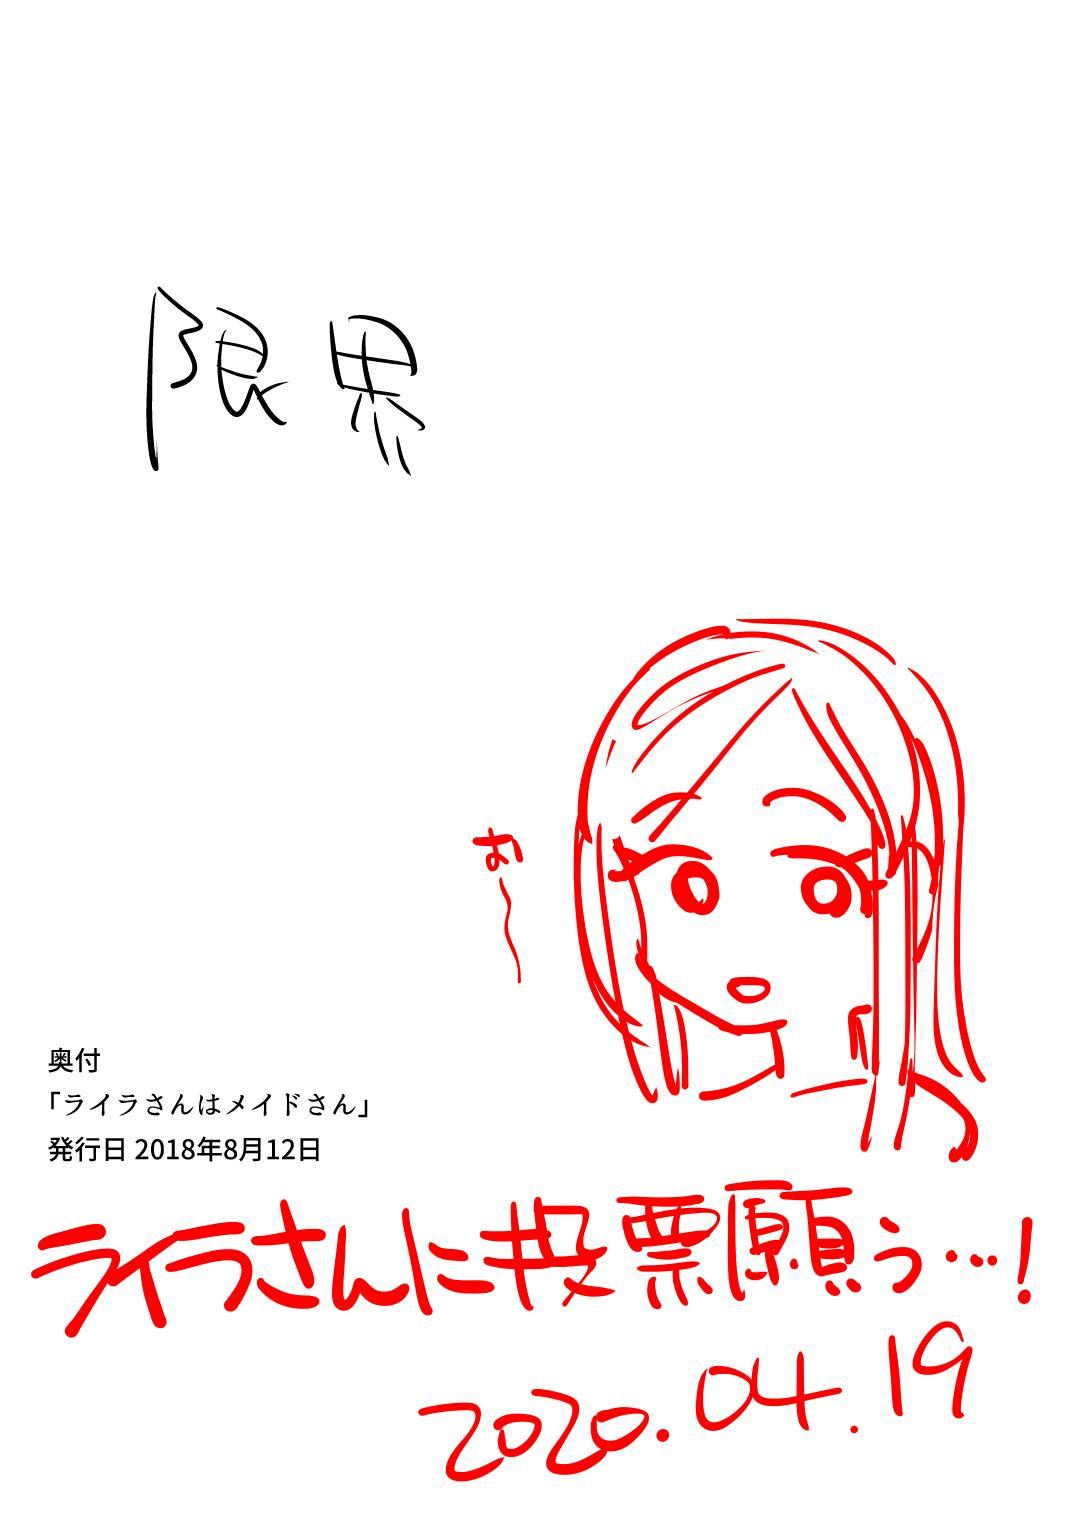 [Hongkong Hanten (Oniku)] Layla-san wa Maid-san (THE IDOLM@STER CINDERELLA GIRLS) [Chinese]  [附聲投票請幫我投萊拉一票漢化] [Digital] 23